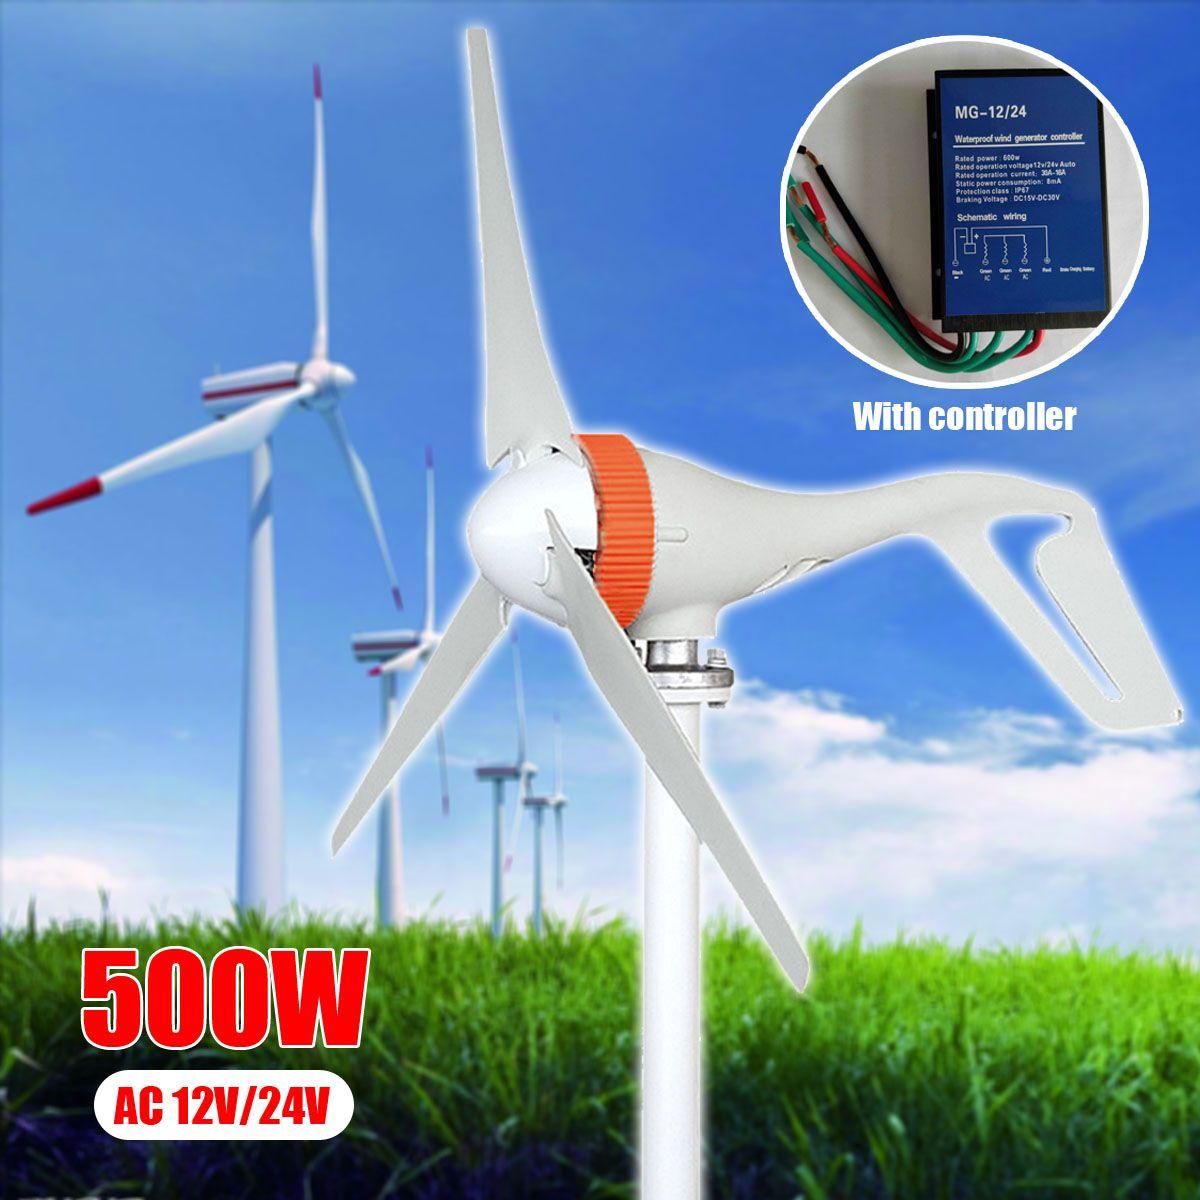 AC 12V/24V 500W Miniature Wind Turbines Generator Mini Wind Turbines With Controller 3 Blades Wind Generator for Home Use